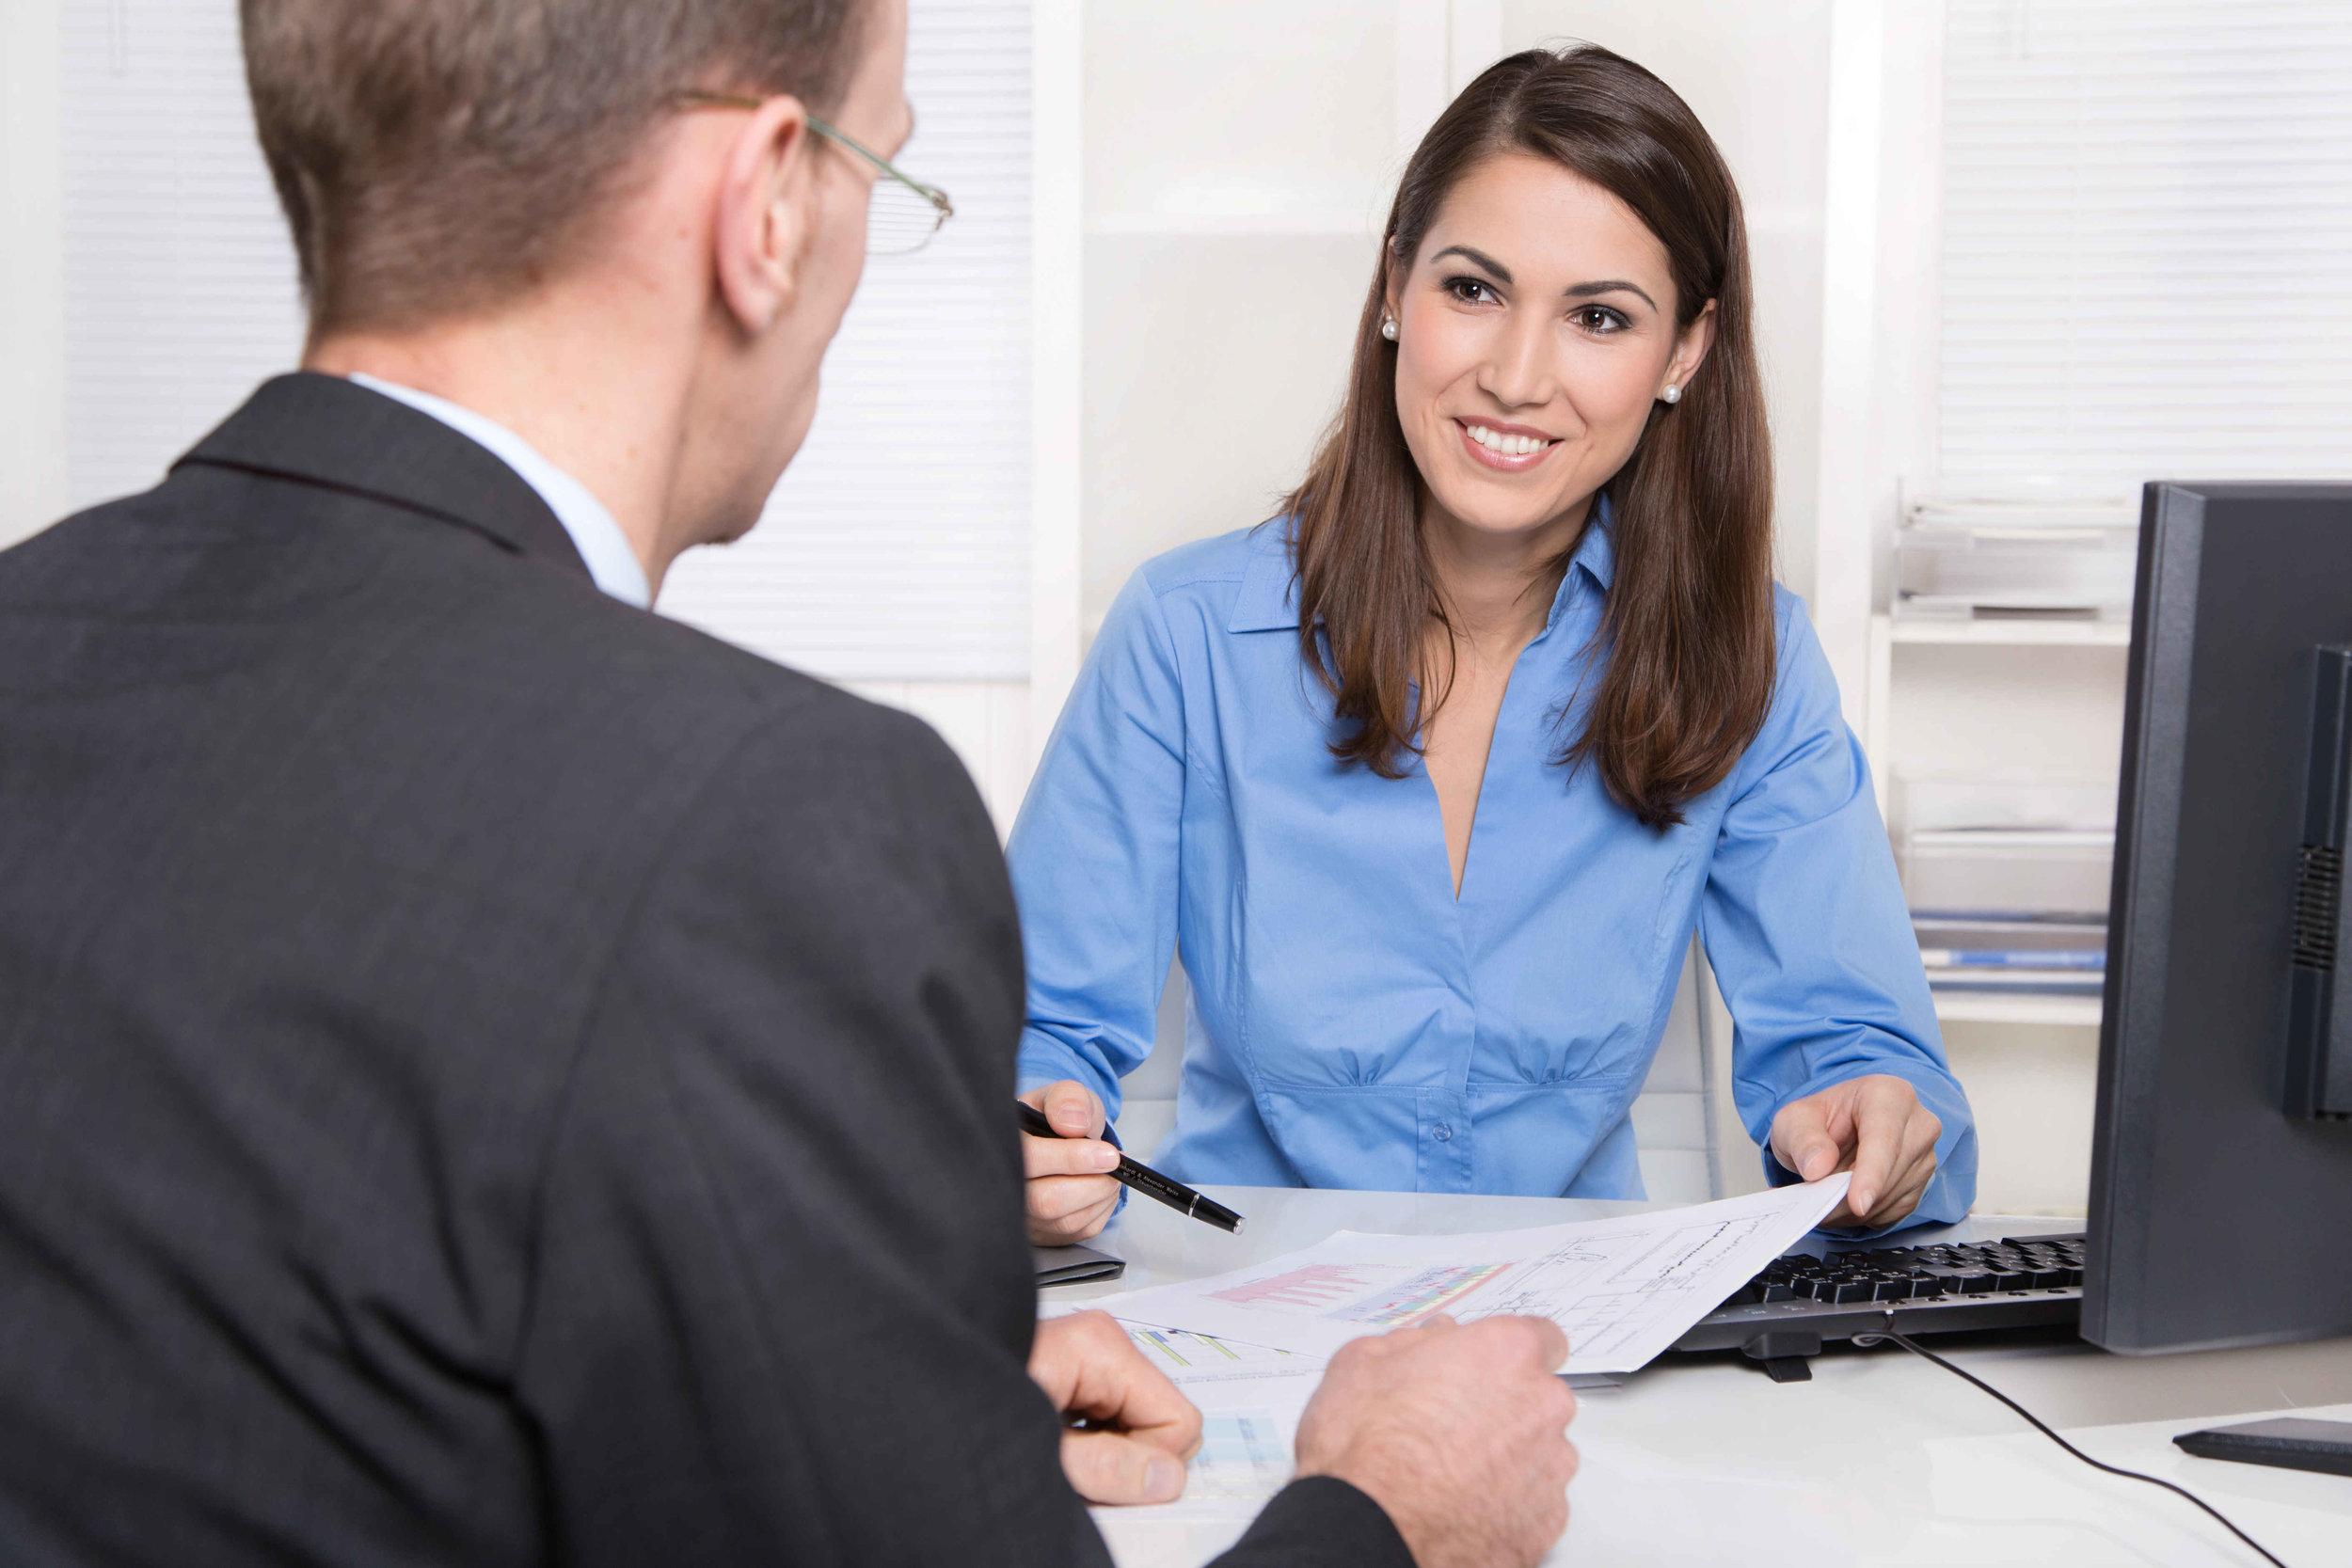 woman-banker-meeting-with-man.jpg